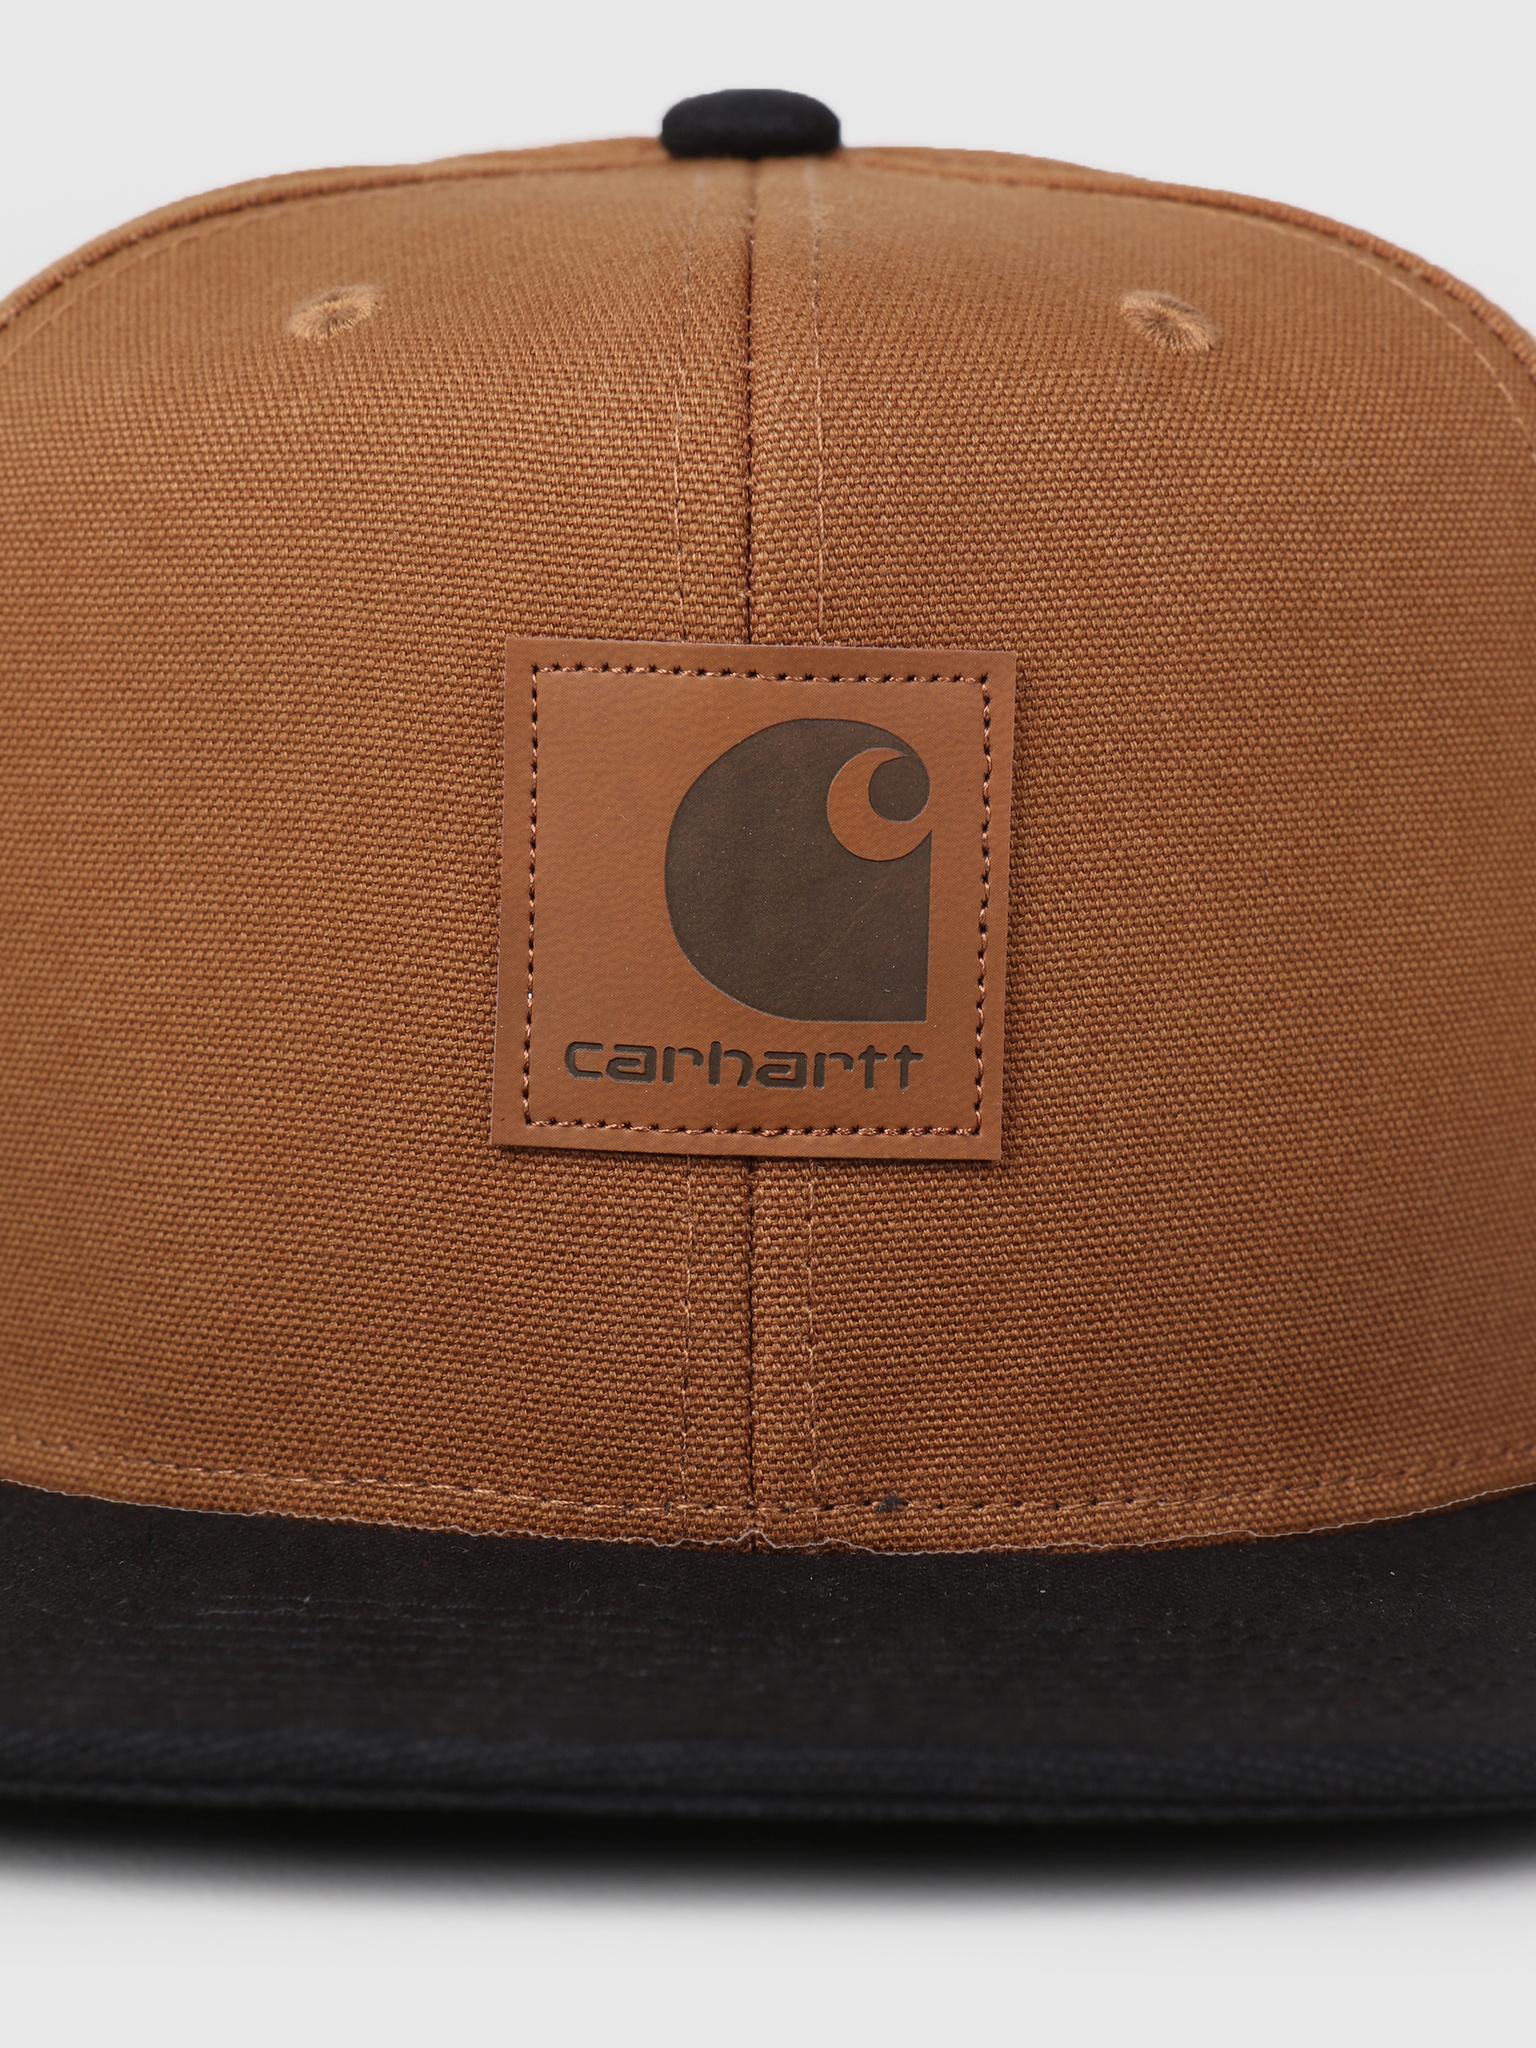 Carhartt WIP Carhartt WIP Logo Cap Bi-Colored Hamilton Brown Black I025735 b75885d16